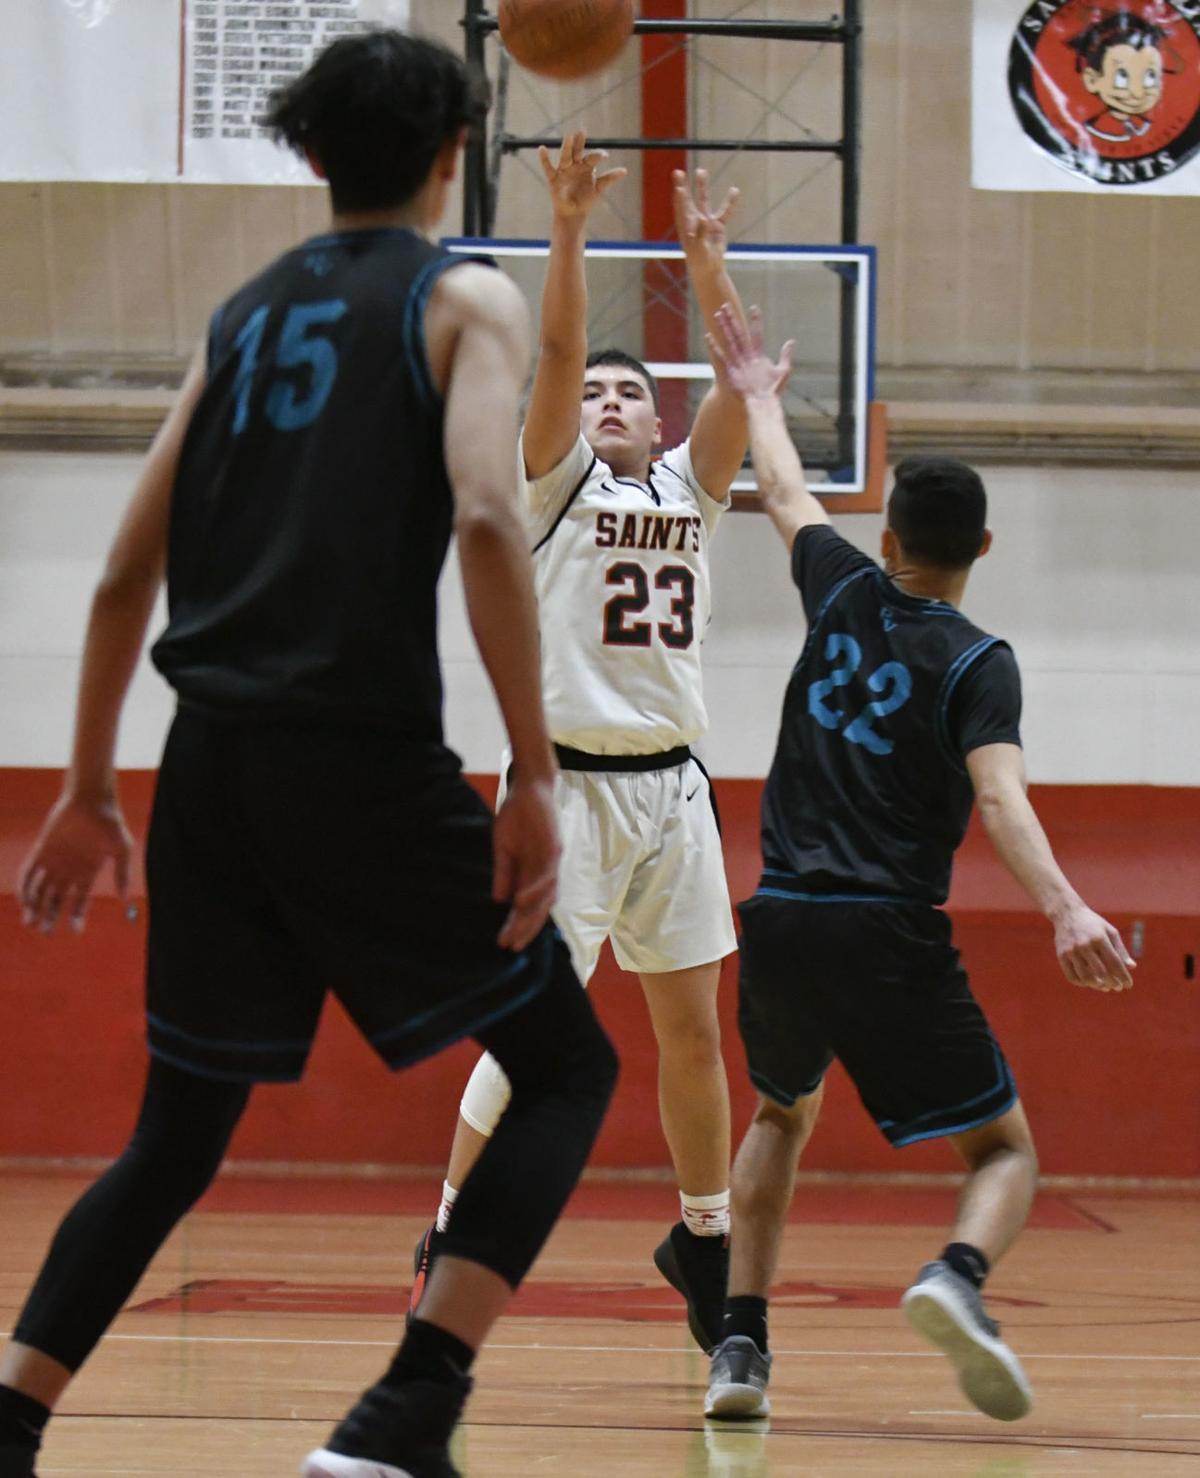 011420 PV SM boys basketball 03.jpg